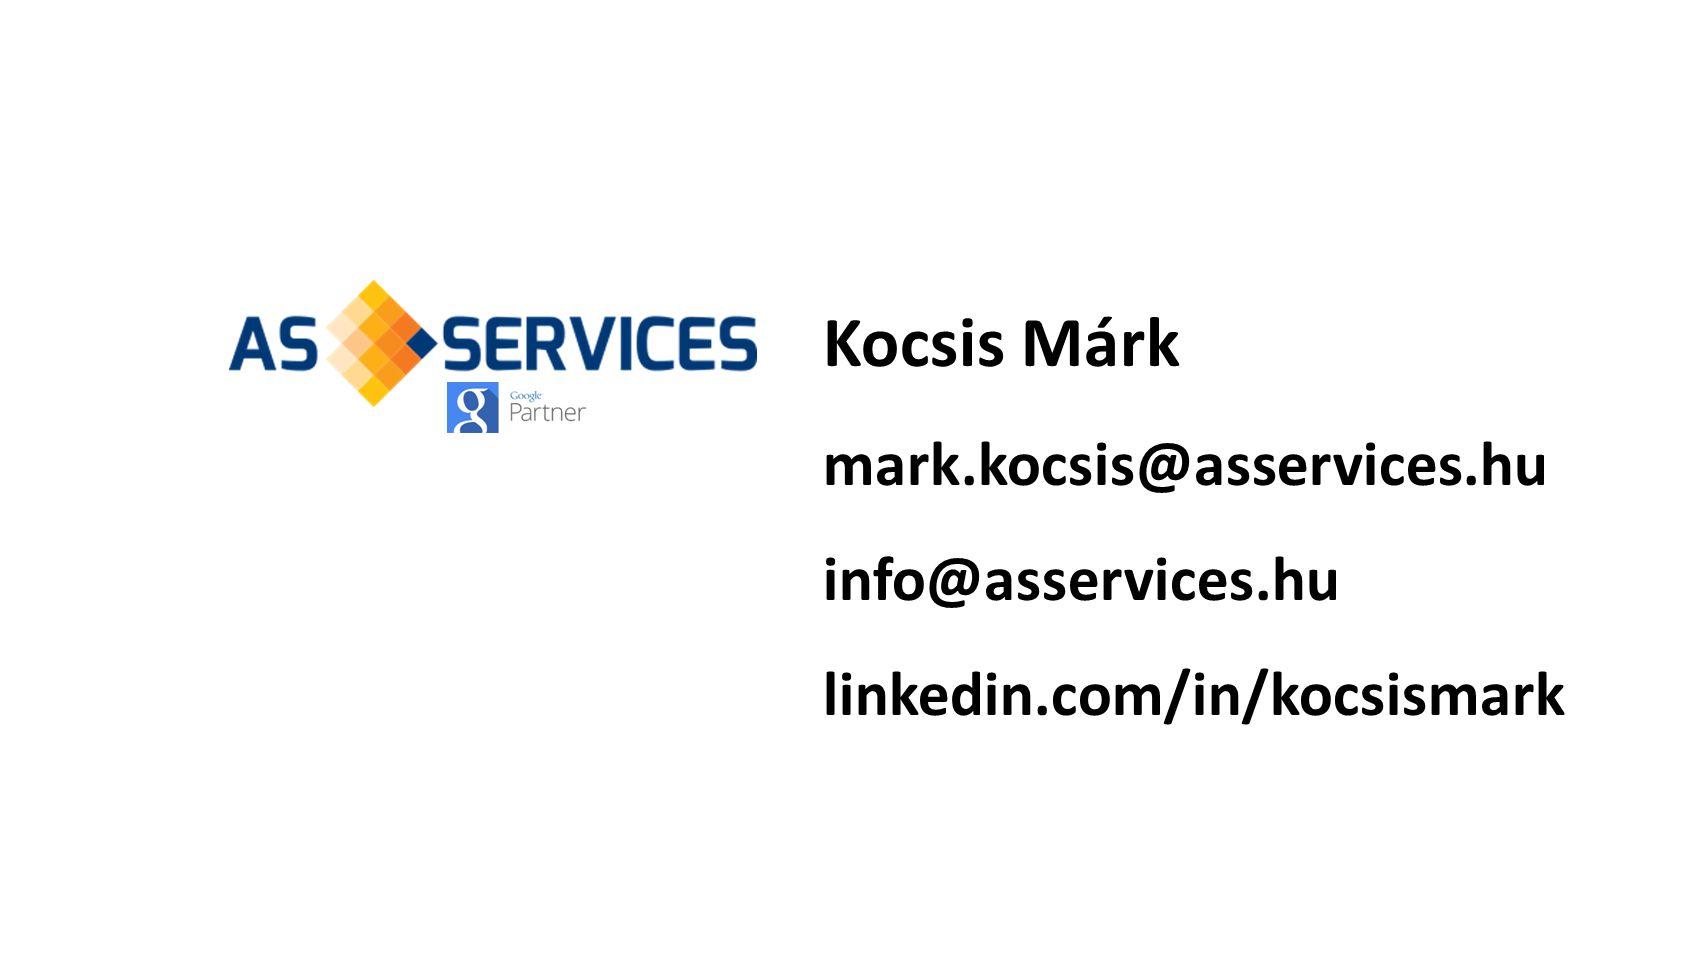 Kocsis Márk mark.kocsis@asservices.hu info@asservices.hu linkedin.com/in/kocsismark